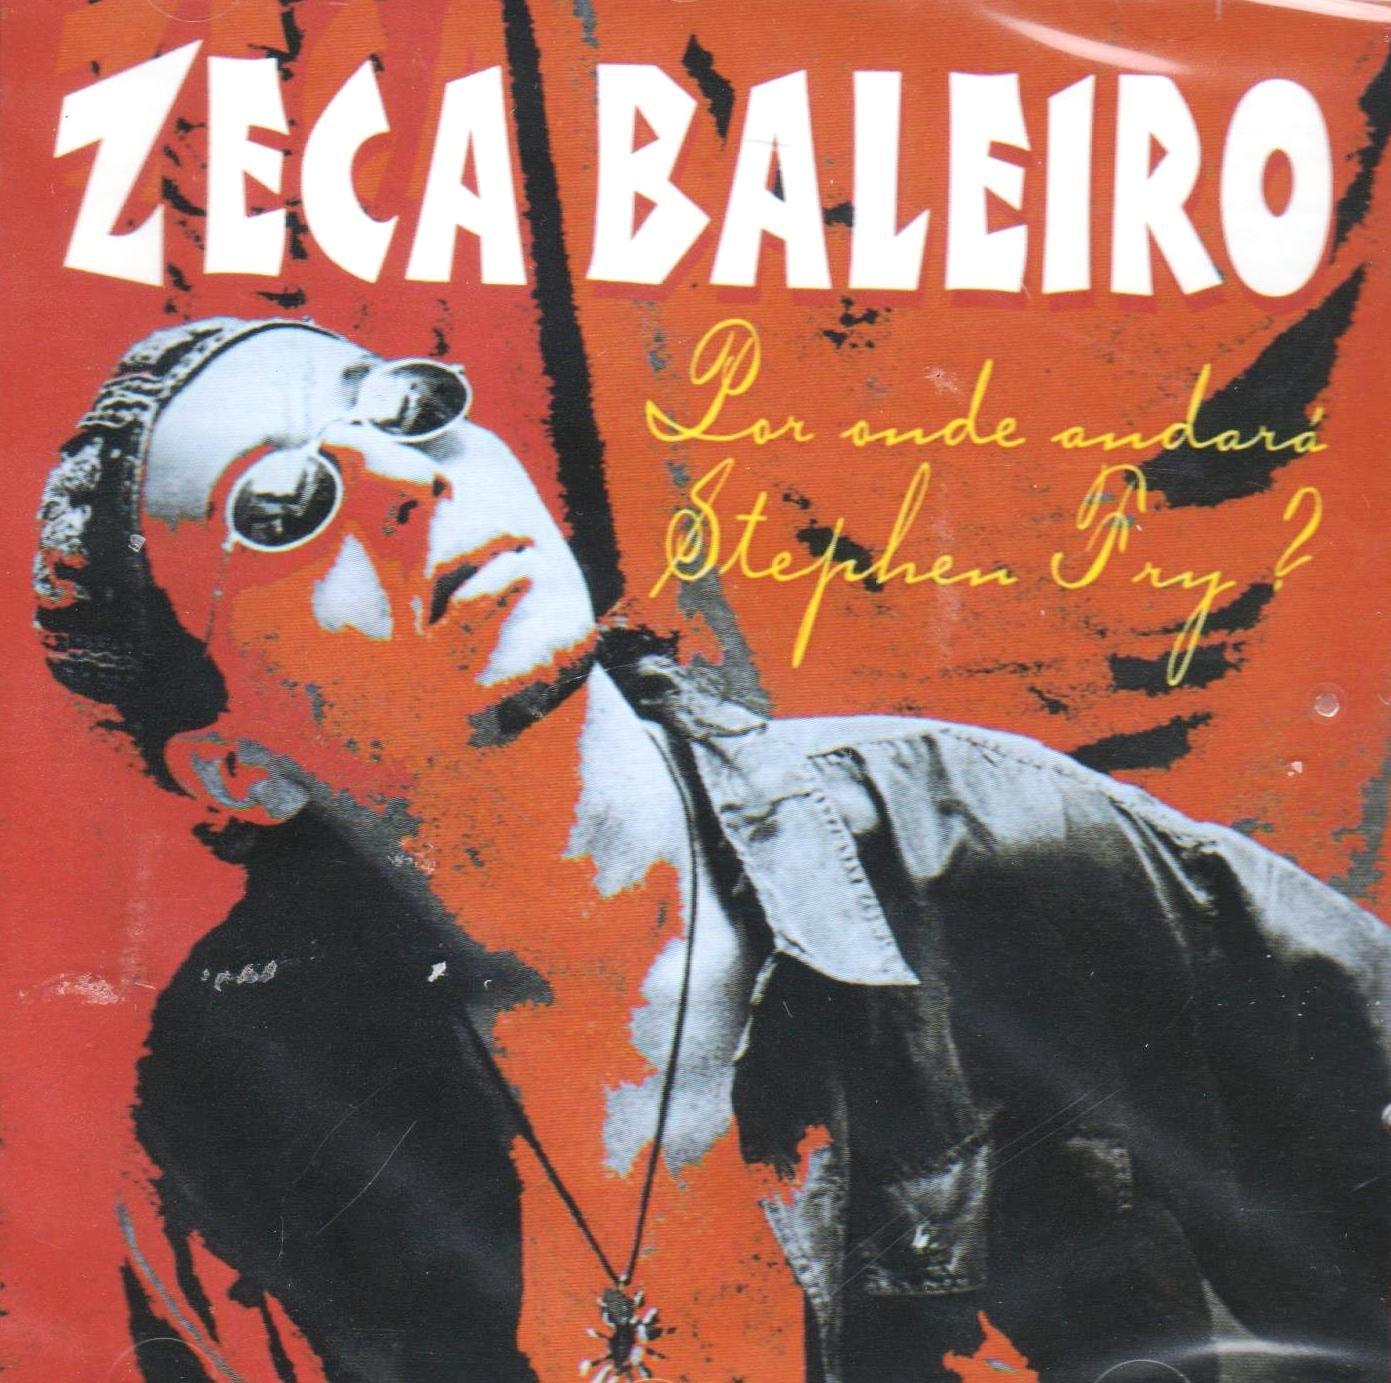 ZECA FRY ANDARA ONDE BALEIRO BAIXAR CD POR STEPHEN